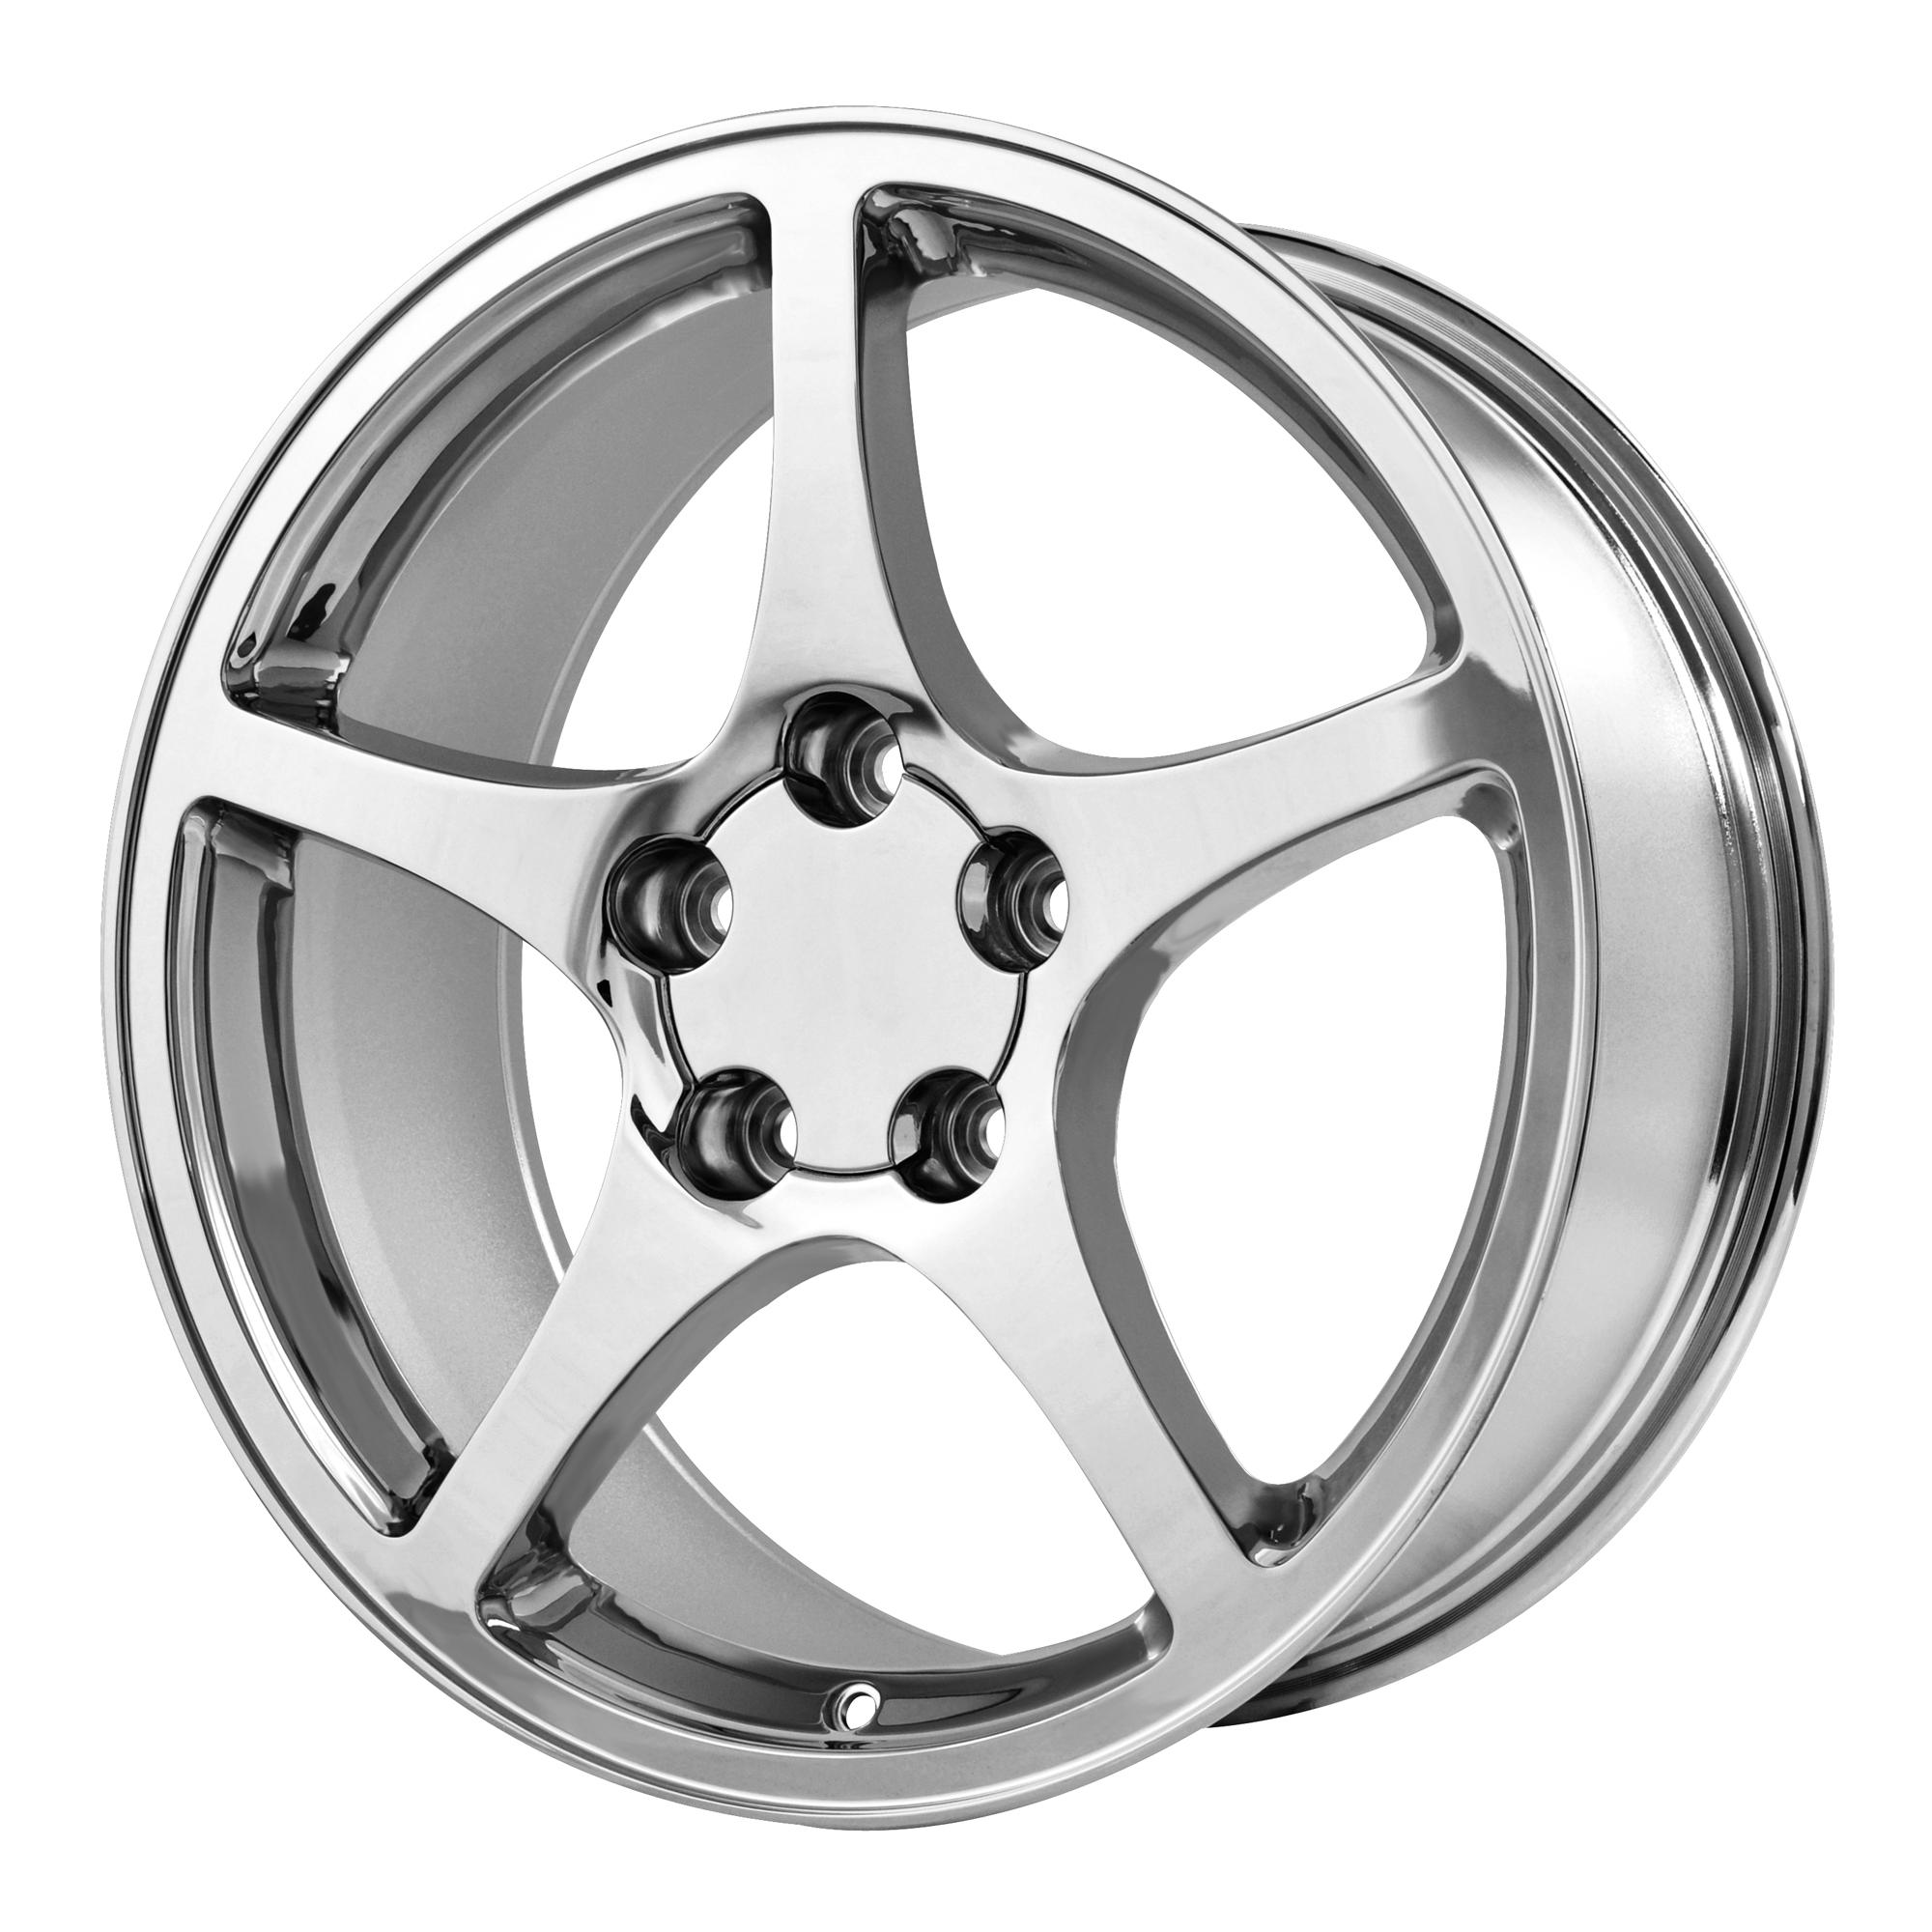 OE Creations Replica Wheels OE Creations 104C Chrome